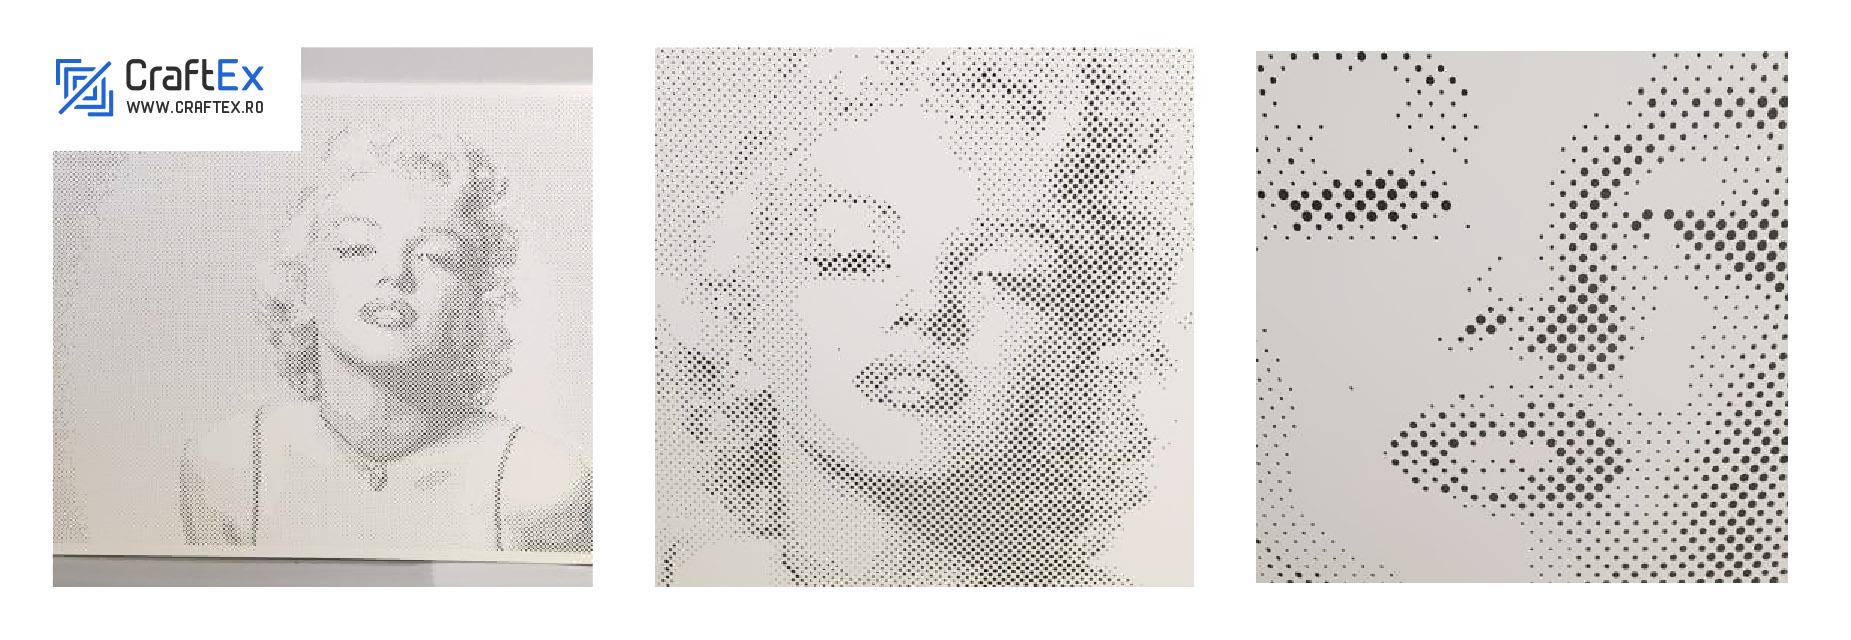 www.craftex.ro - Portrete - Marylin